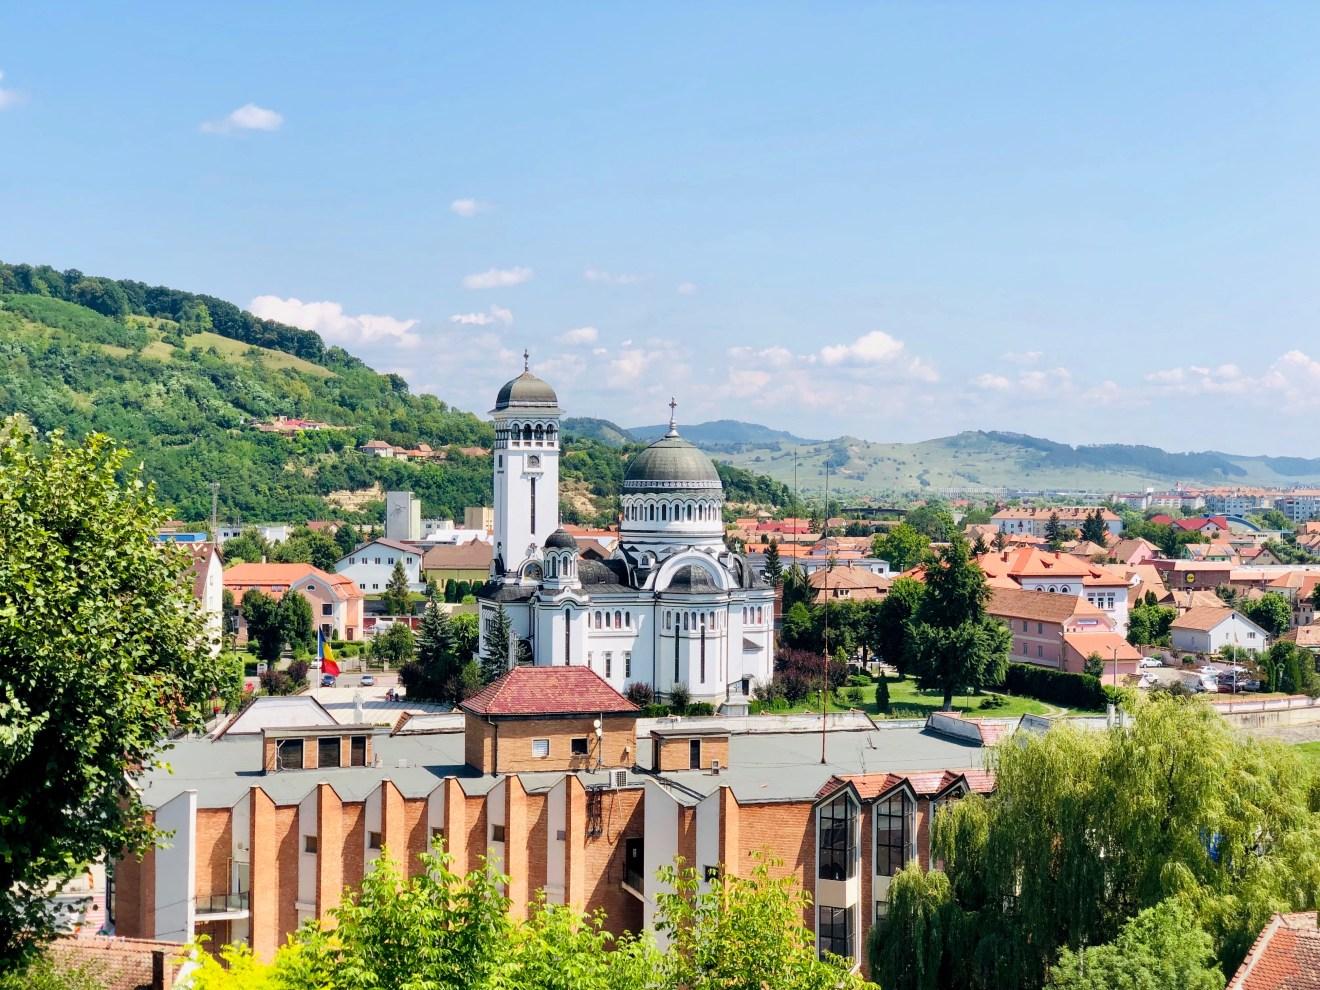 Römisch-katholische Kirche Citadel Sighesoara Rumänien